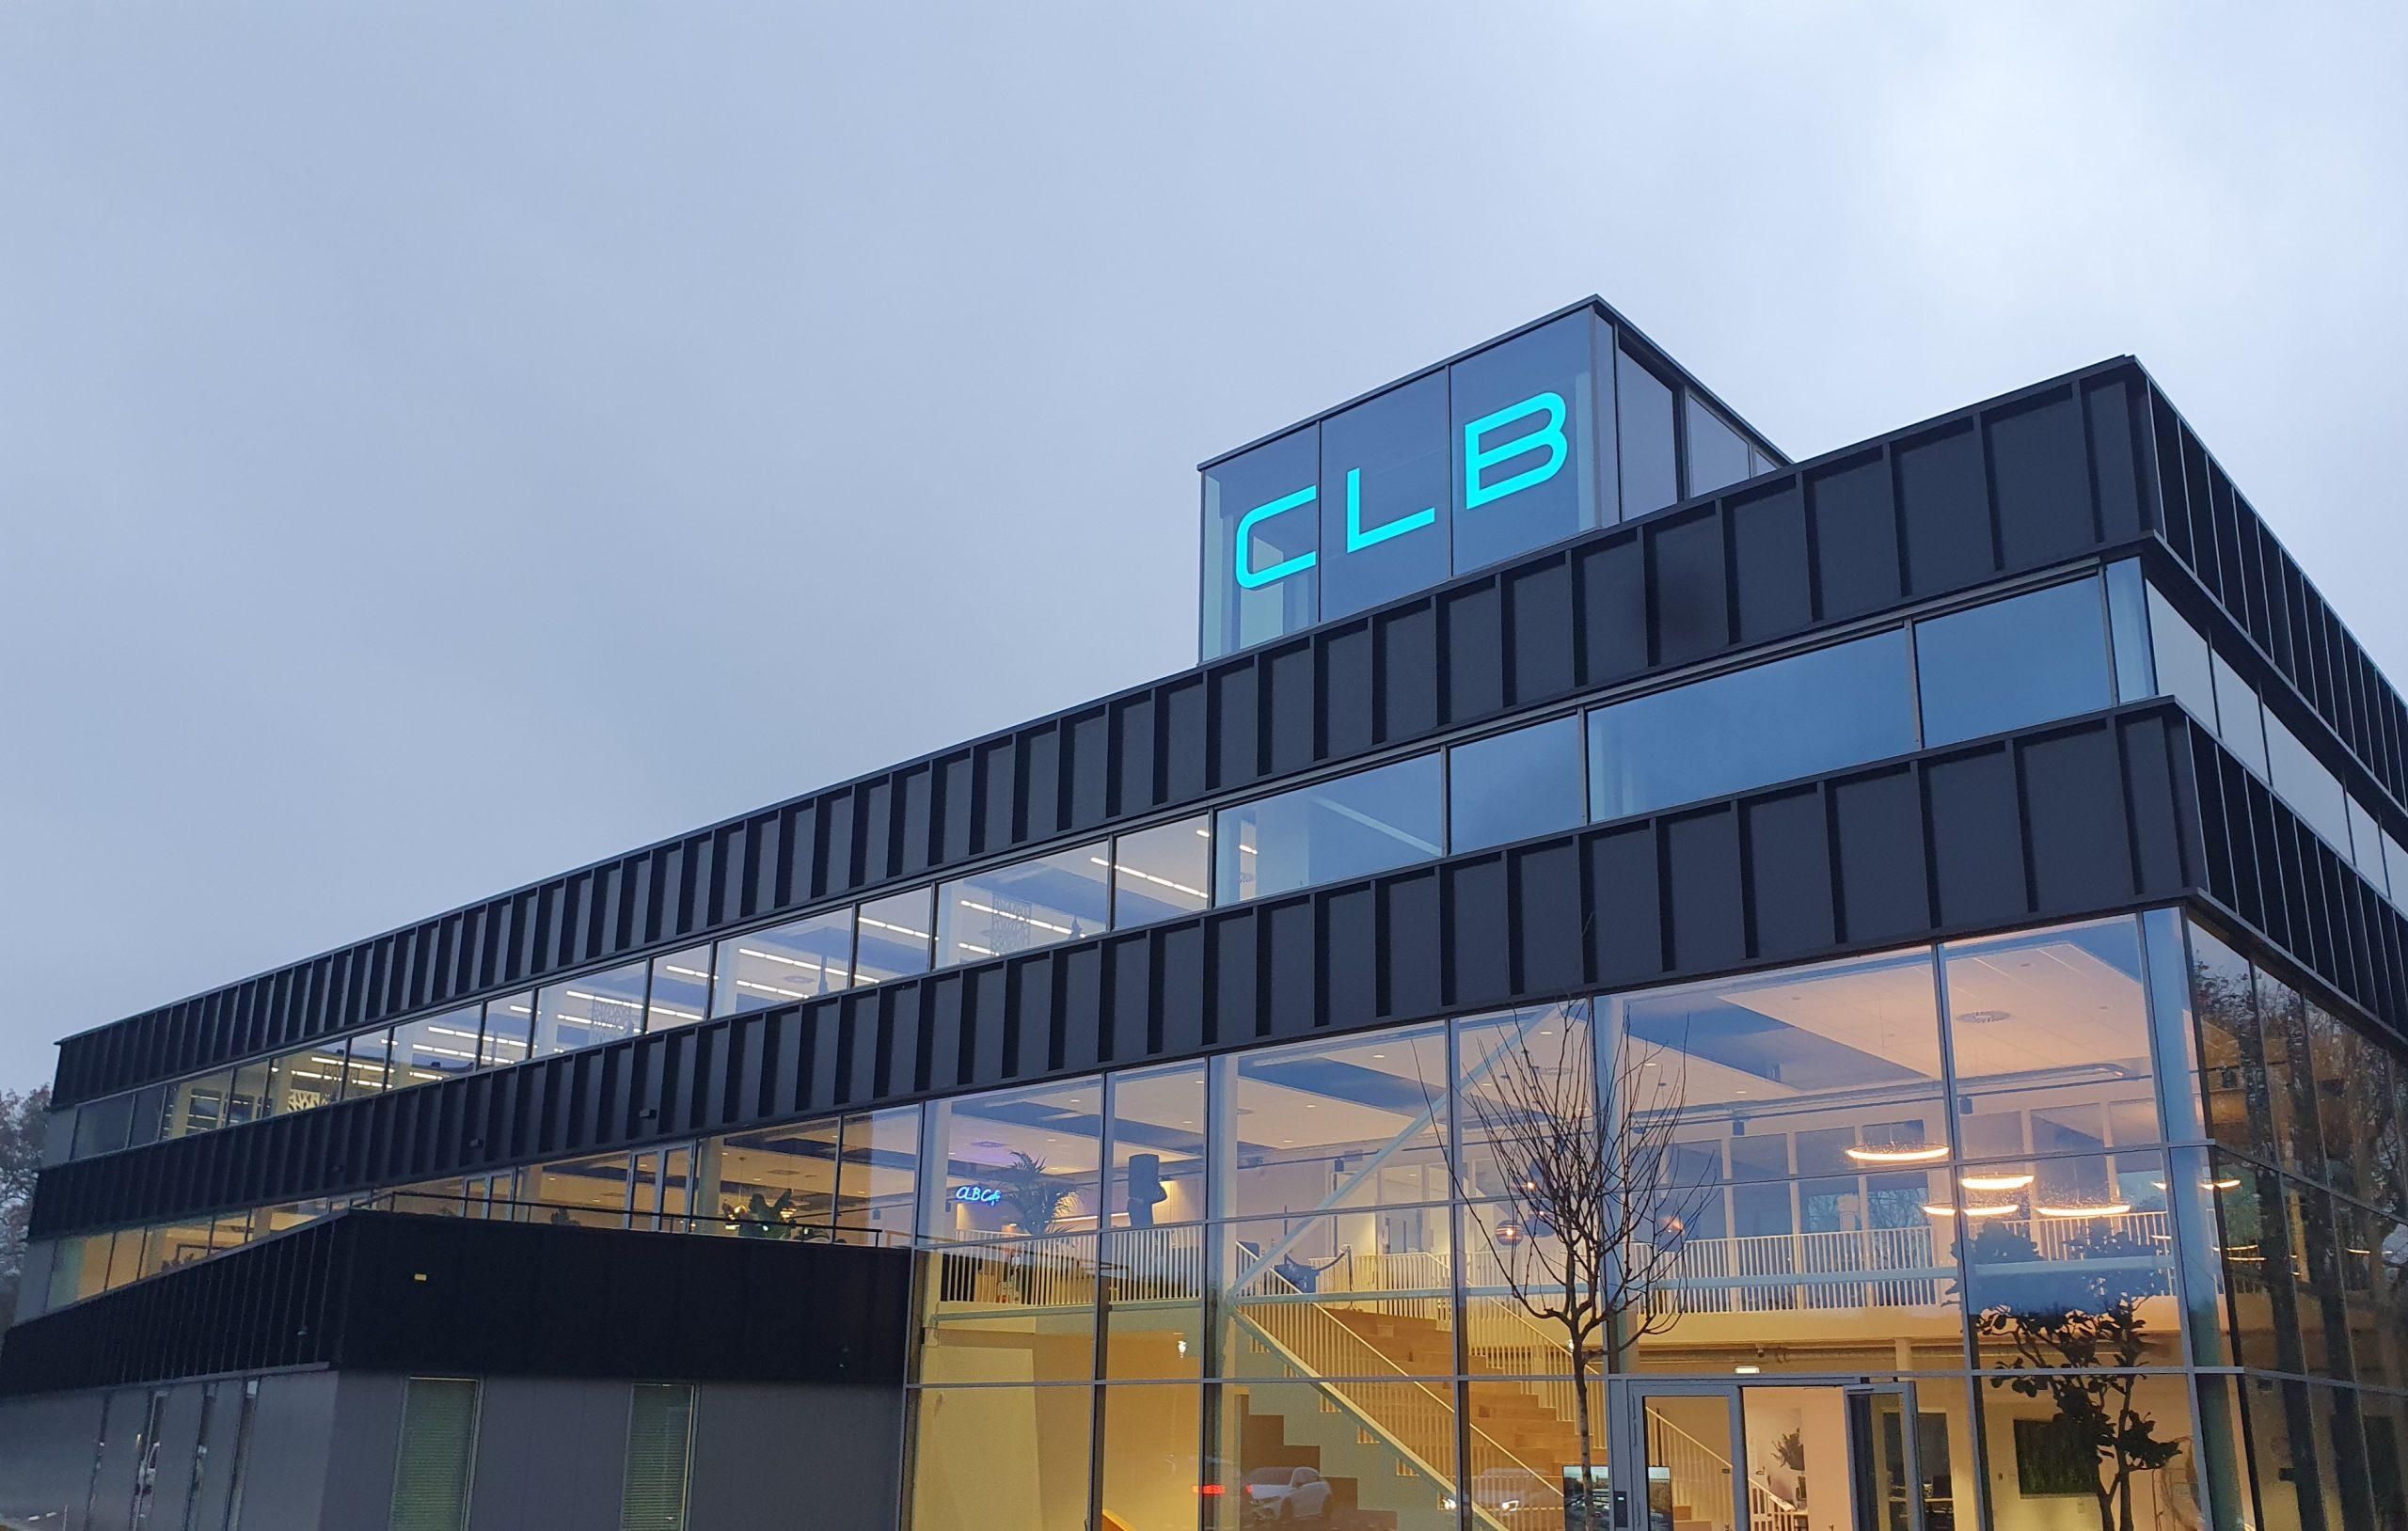 "<span class=""timelineyear"">2020</span><h4 class=""timelinetitle"">Nieuw kantoor in Oosterhout</h4>"